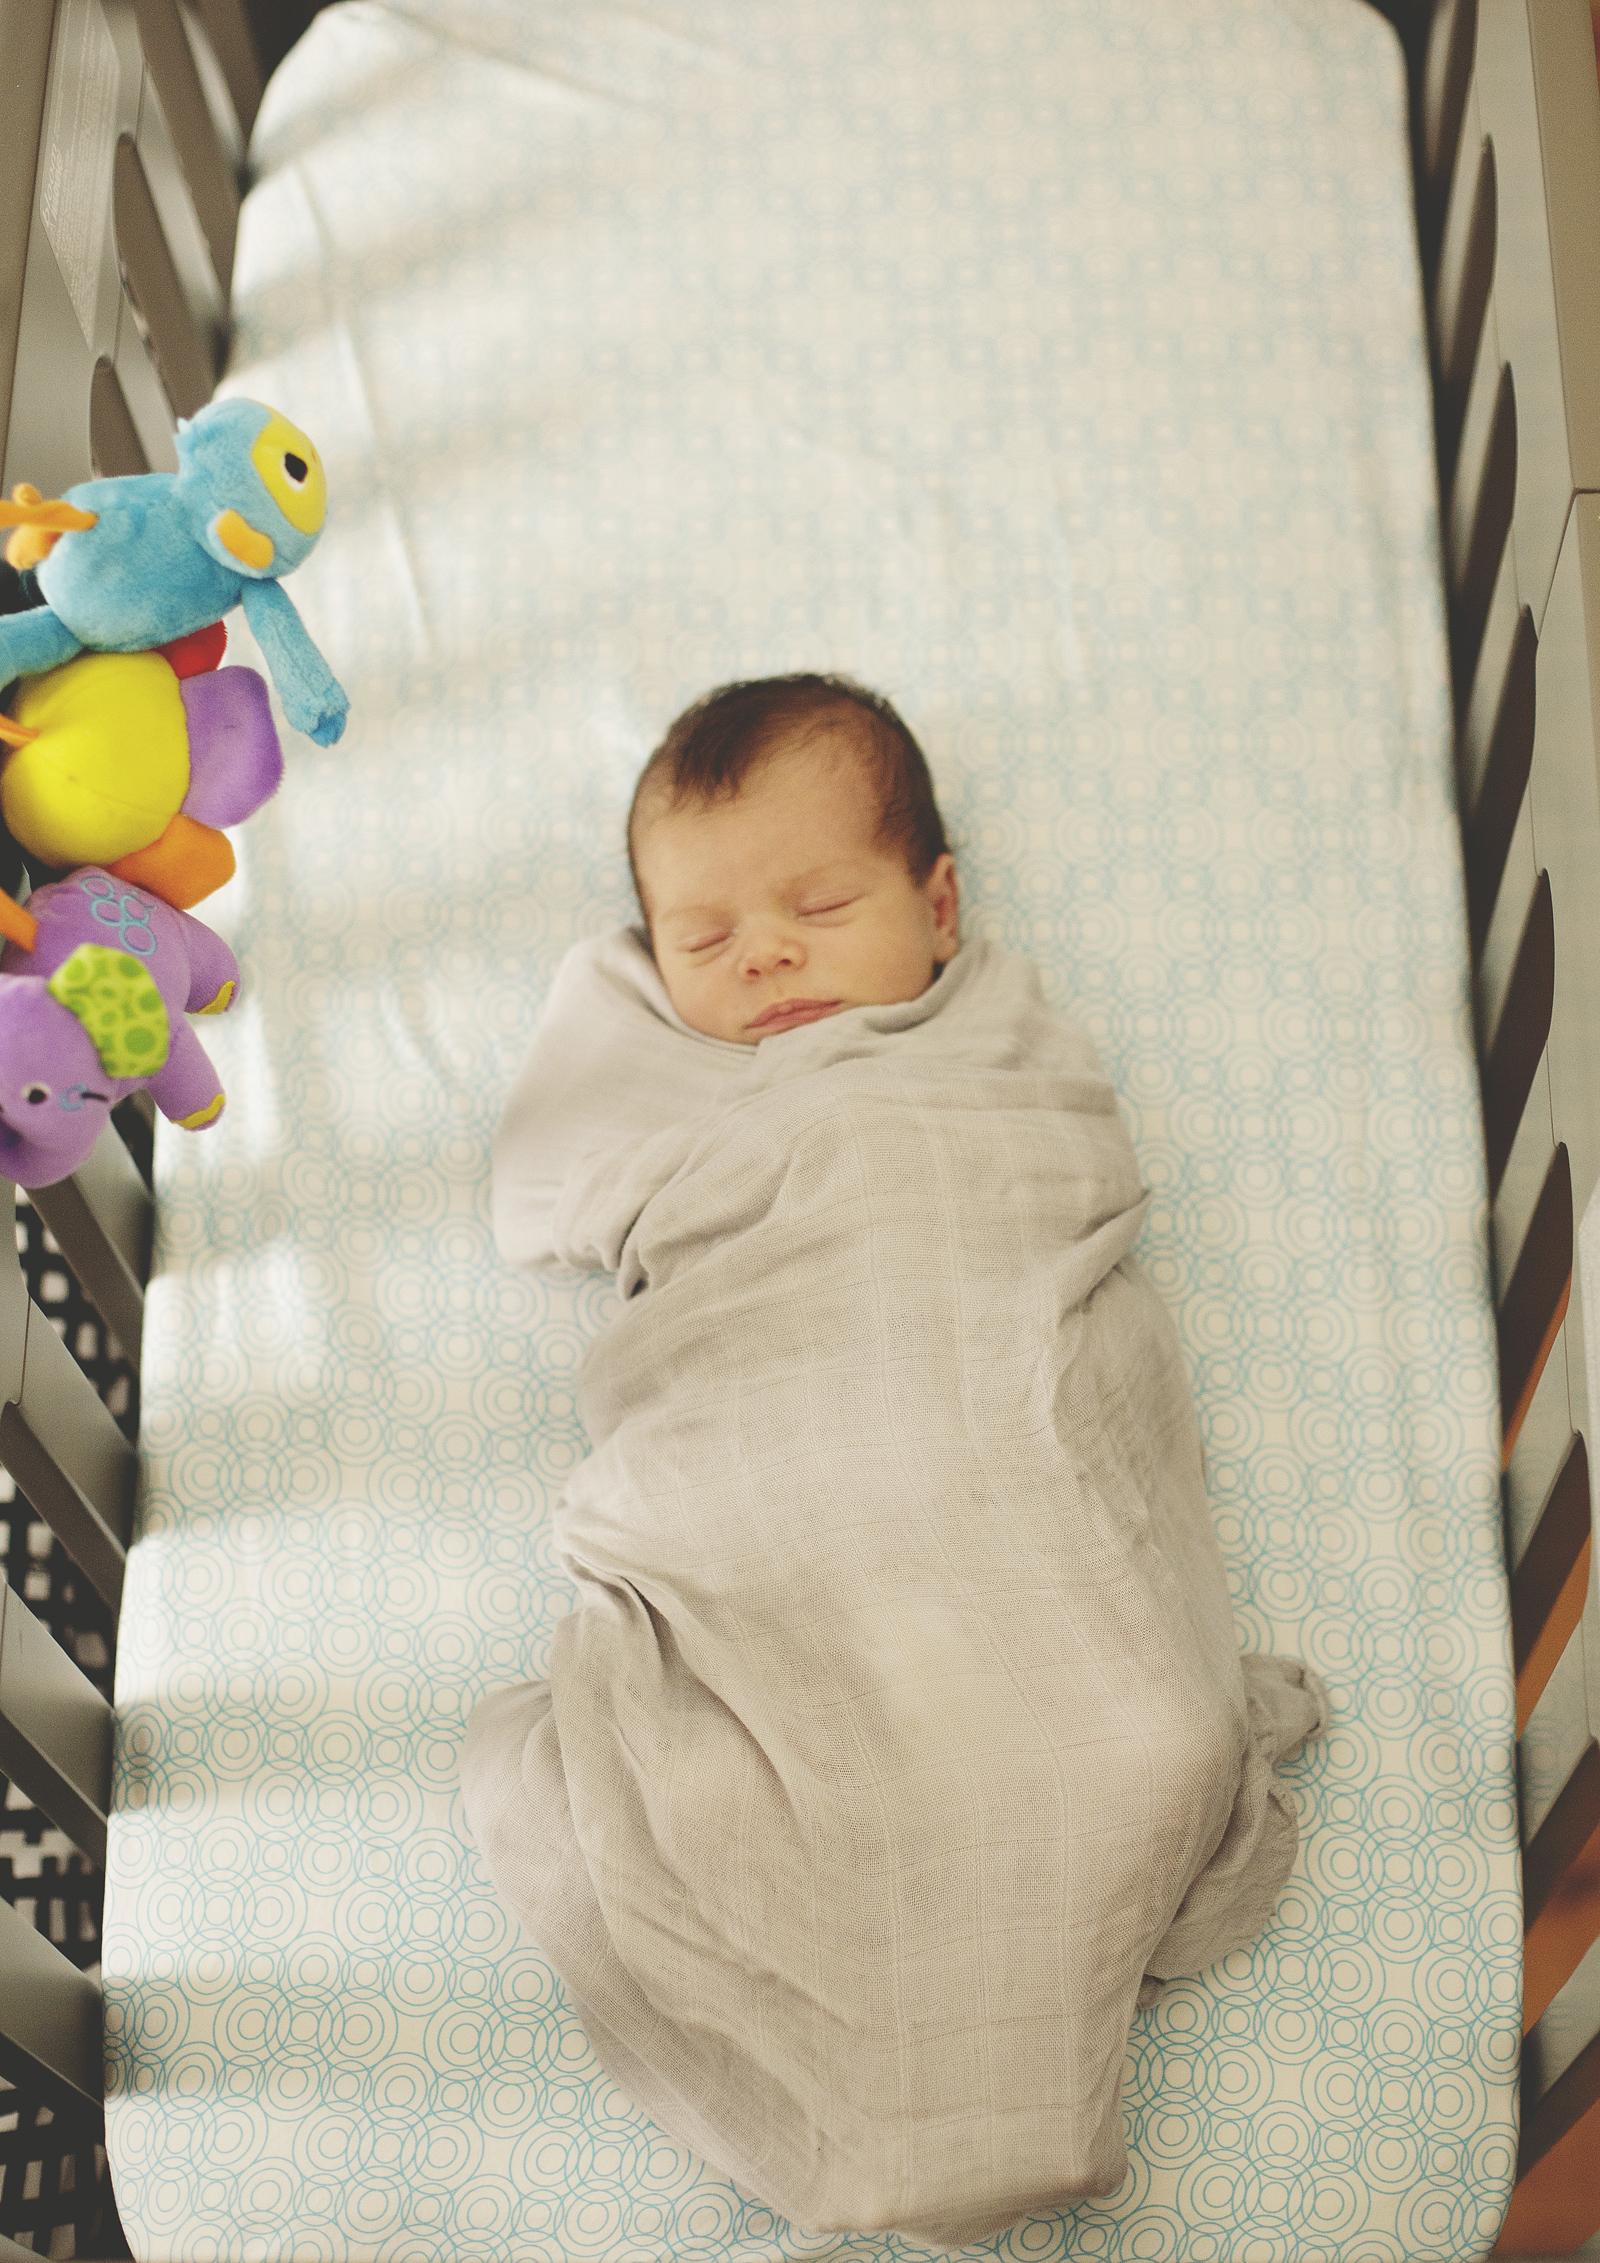 Newborn baby in his cot!